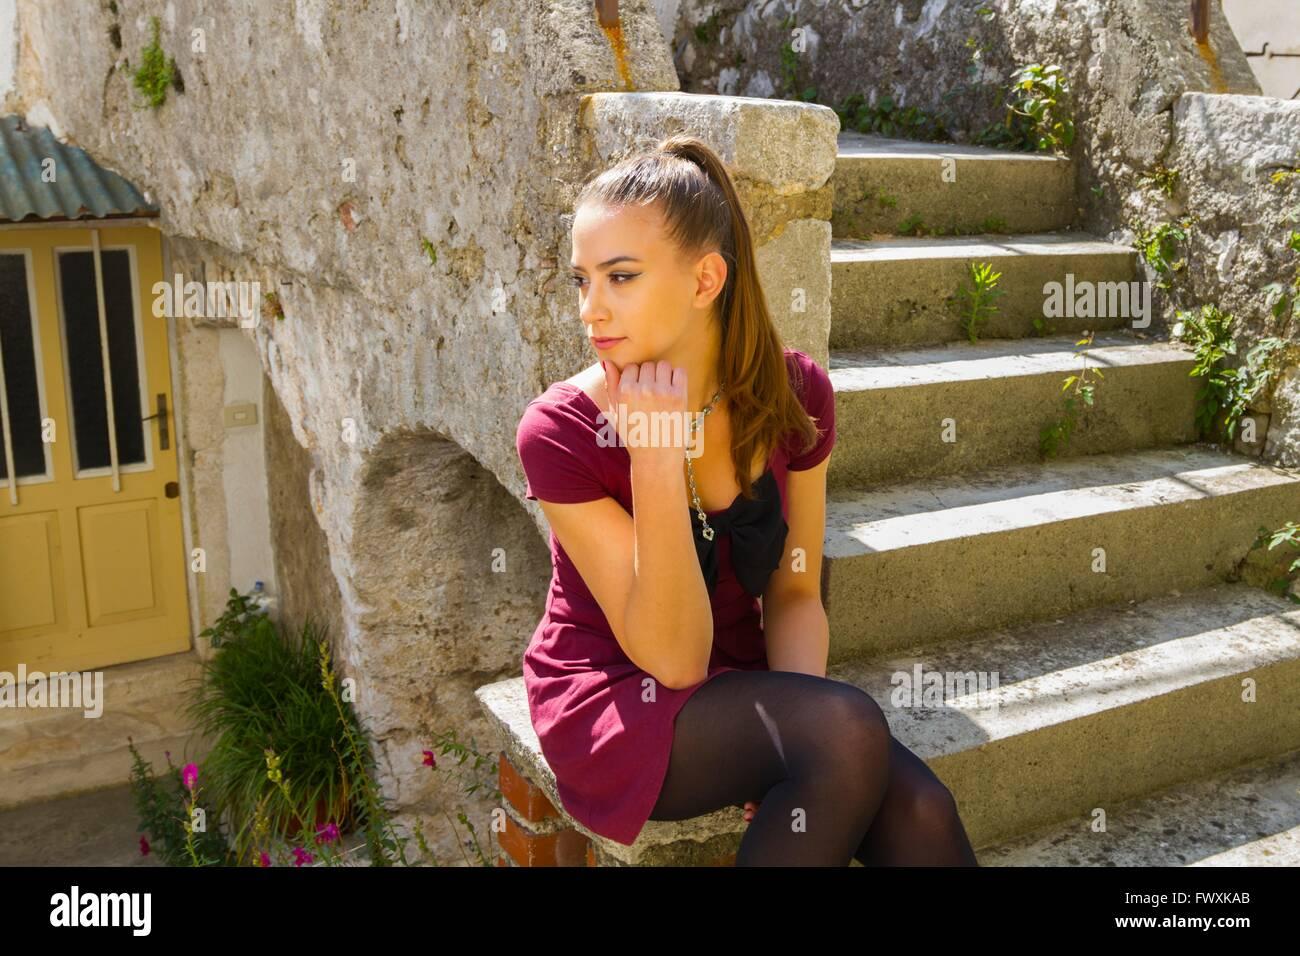 waiting before entrance teen girl violet short mini dress